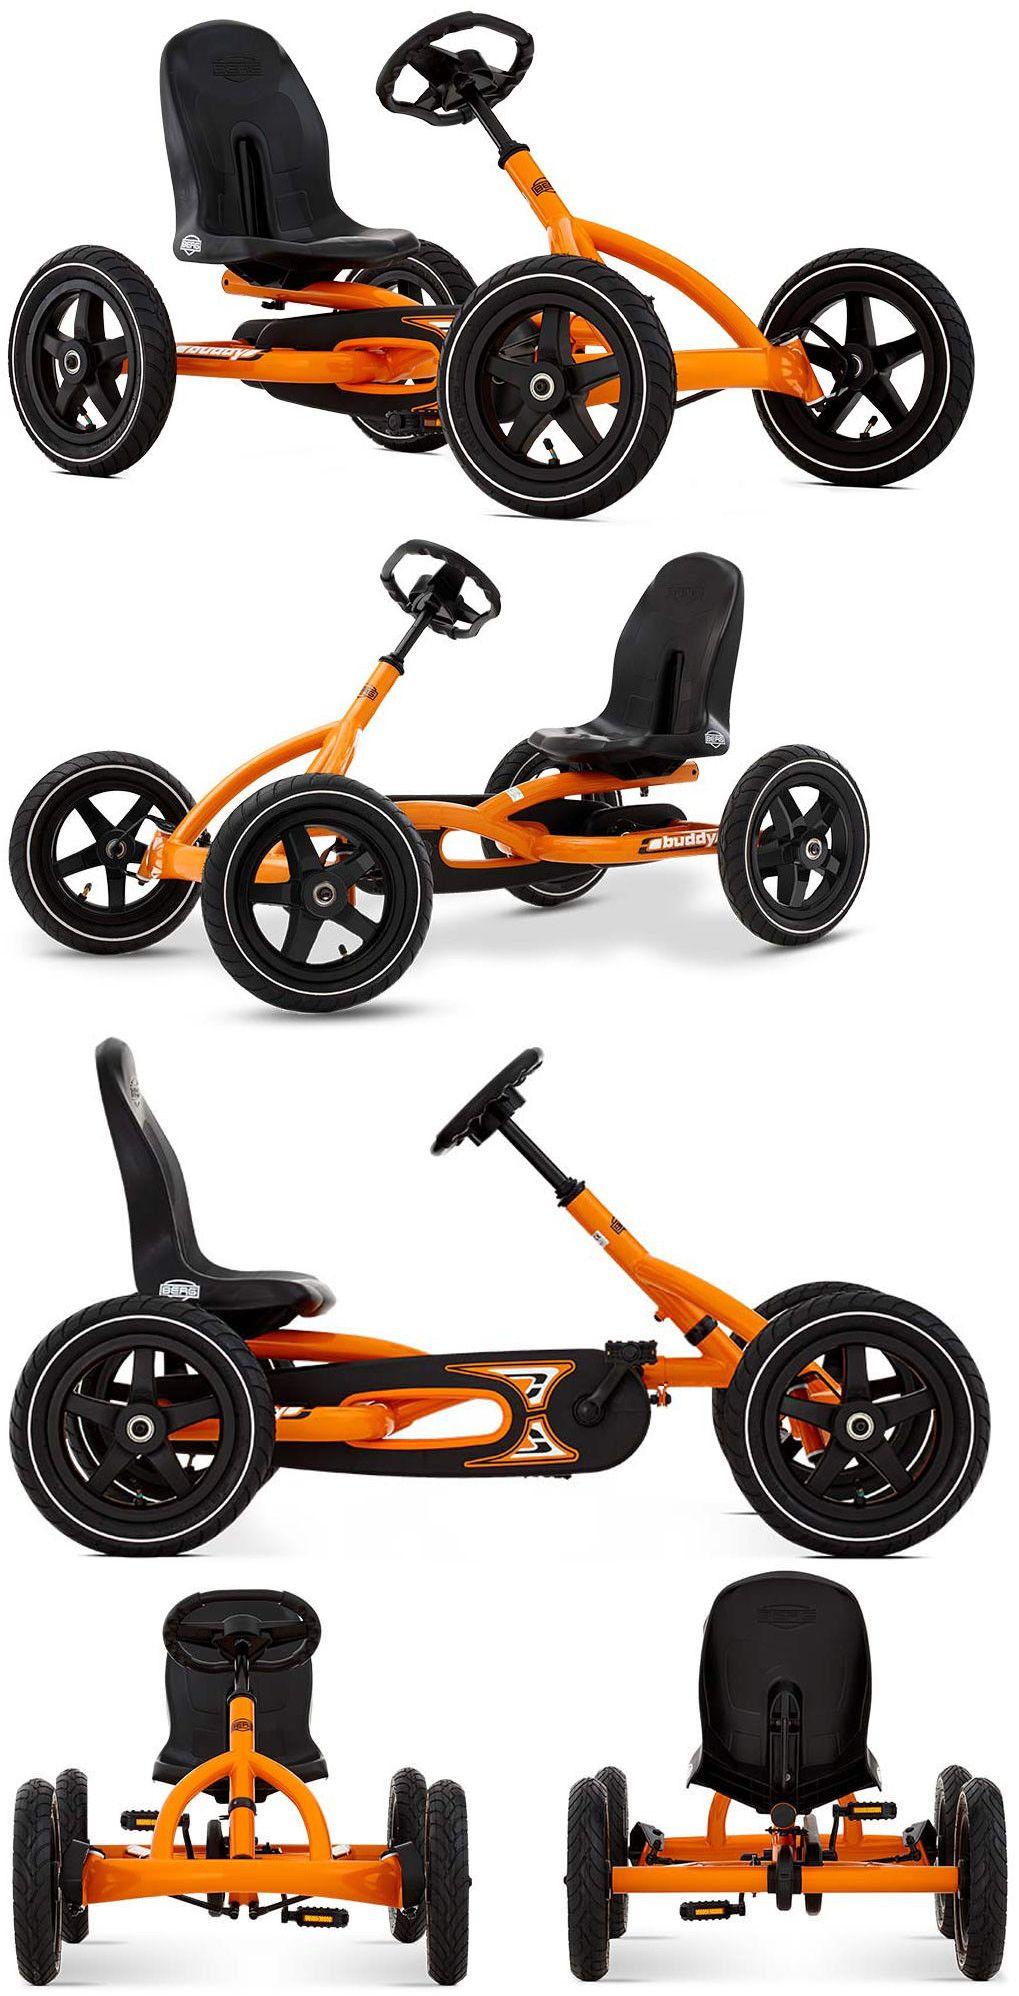 1970Now 19022 Berg Buddy Orange Kids Pedal Car Go Kart 3